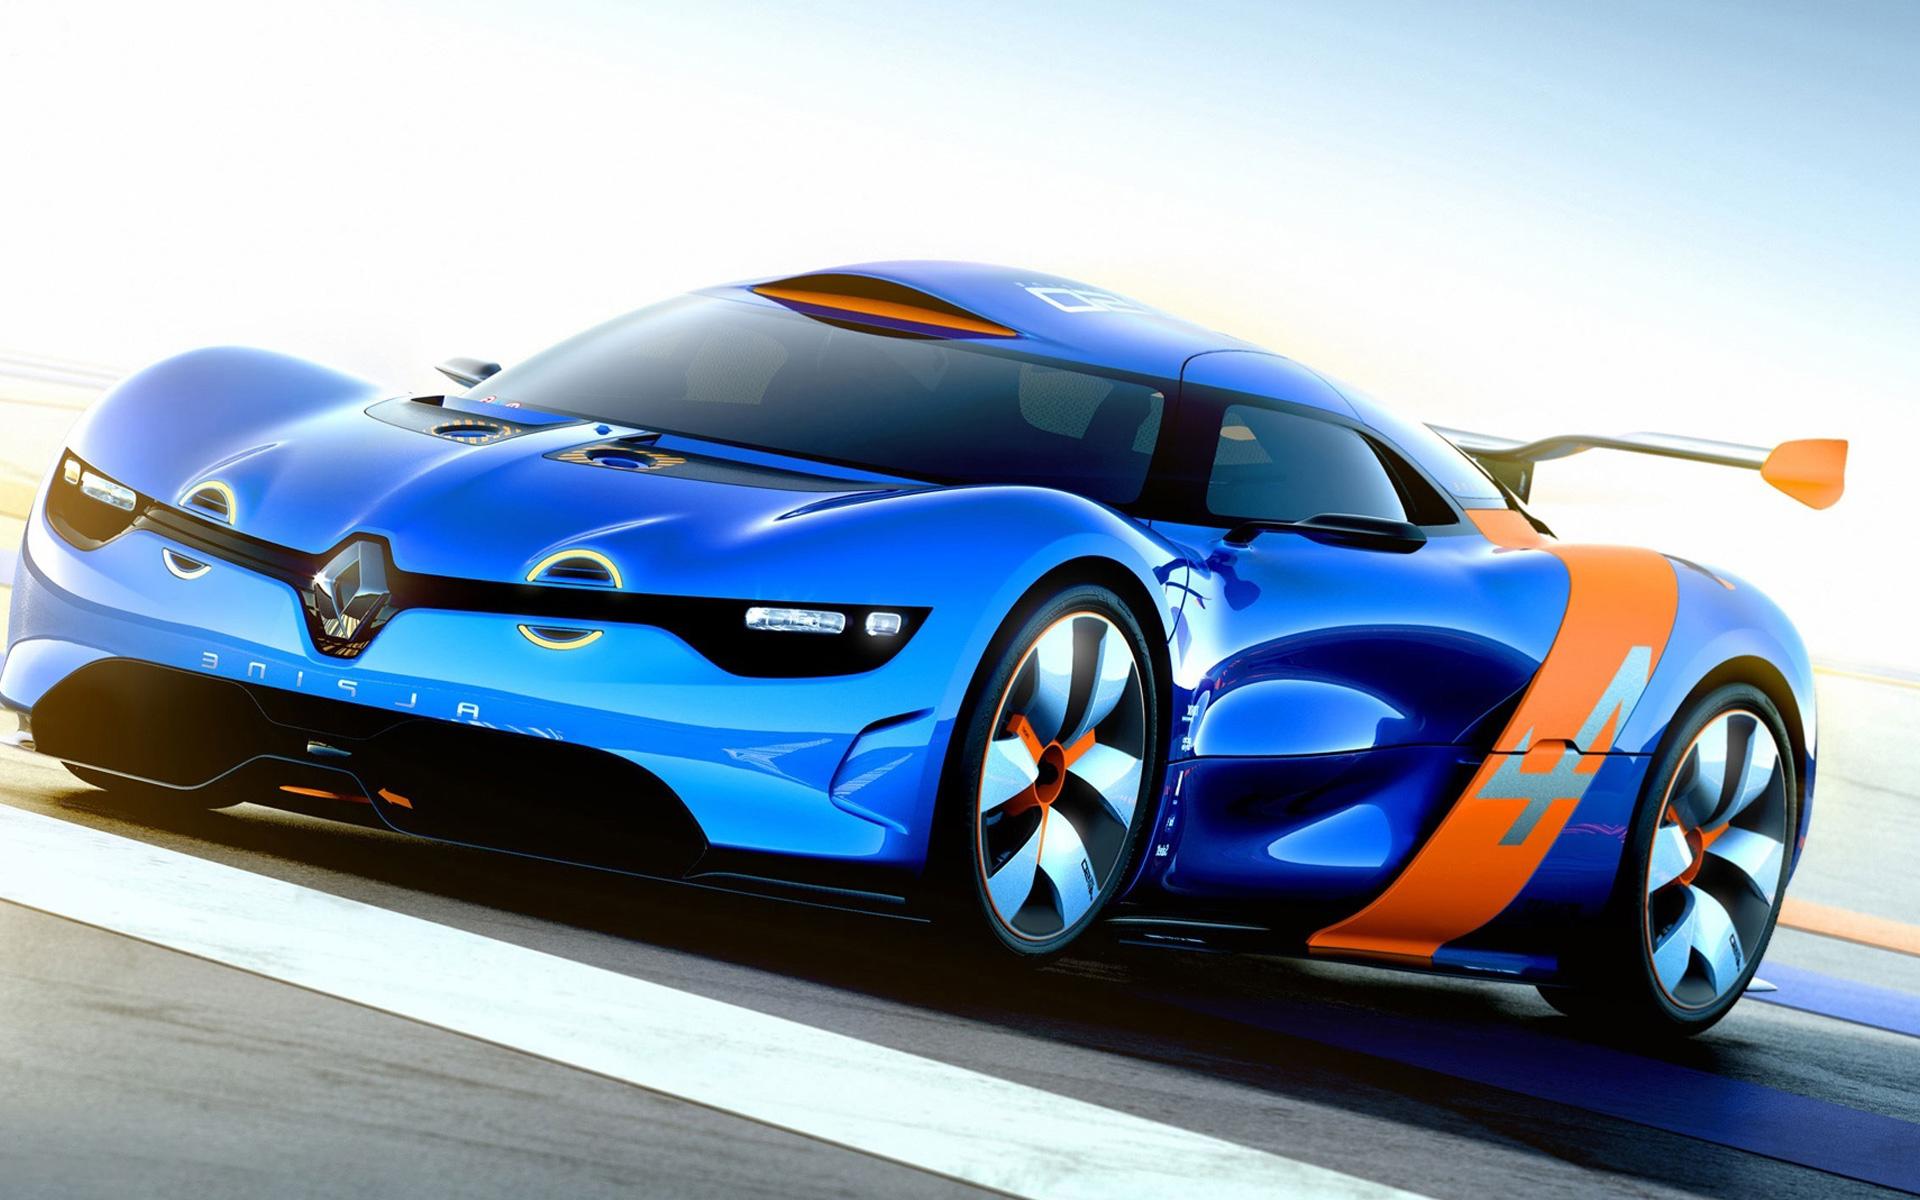 renault alpine blue sports car 12133 wallpaper wallpaper hd